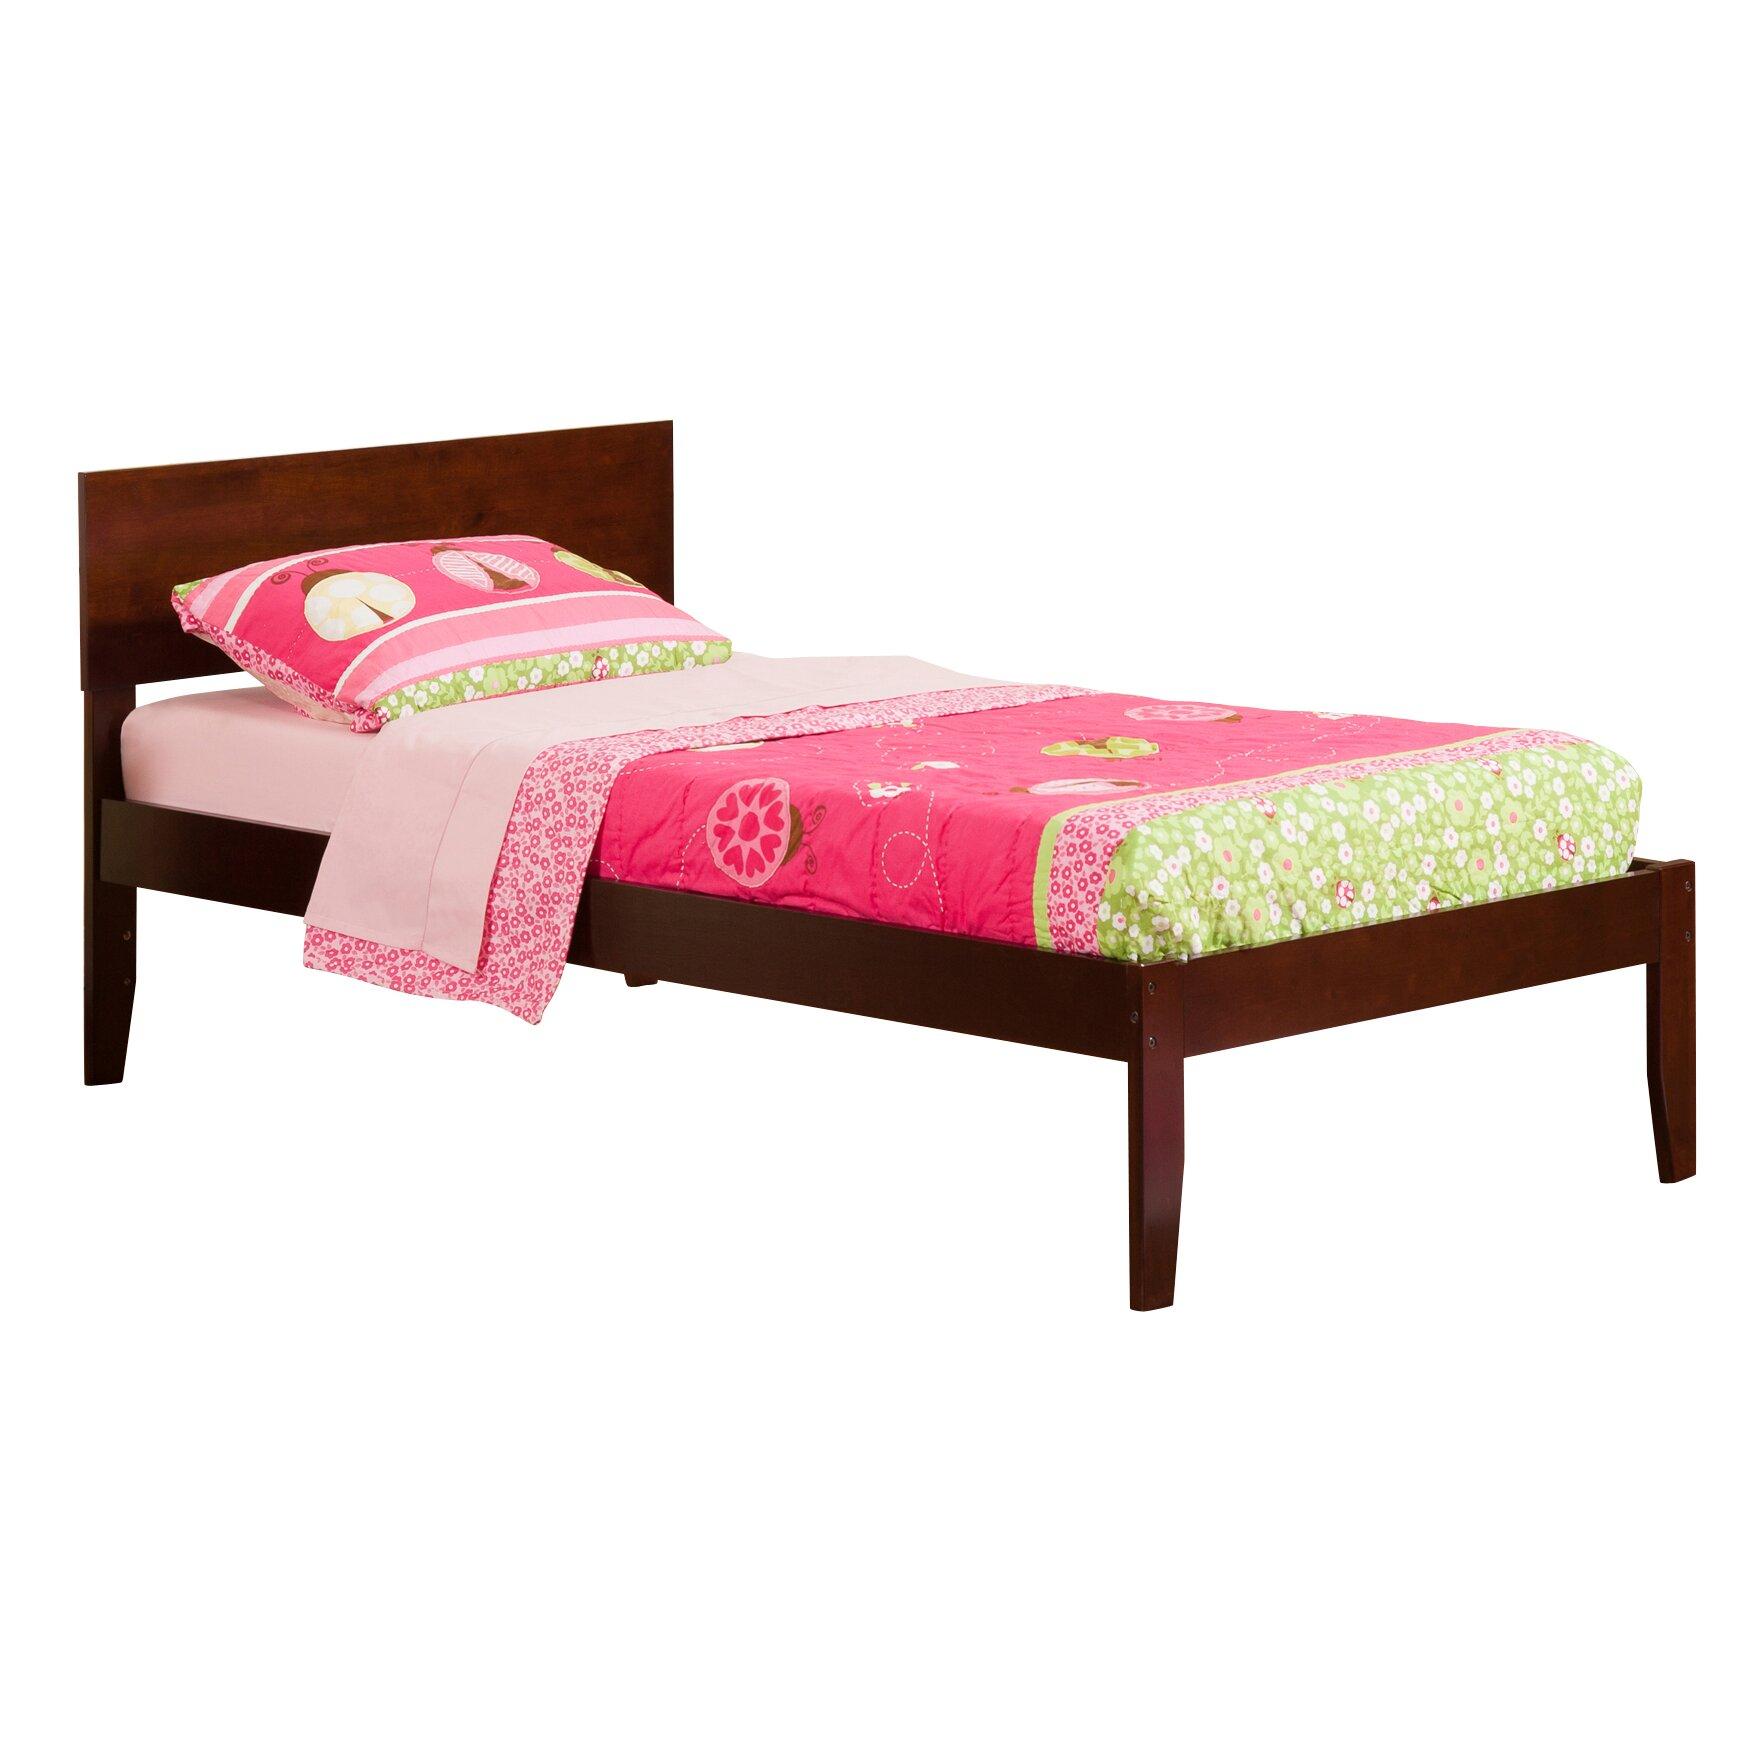 Wayfair Twin Extra Long Bed